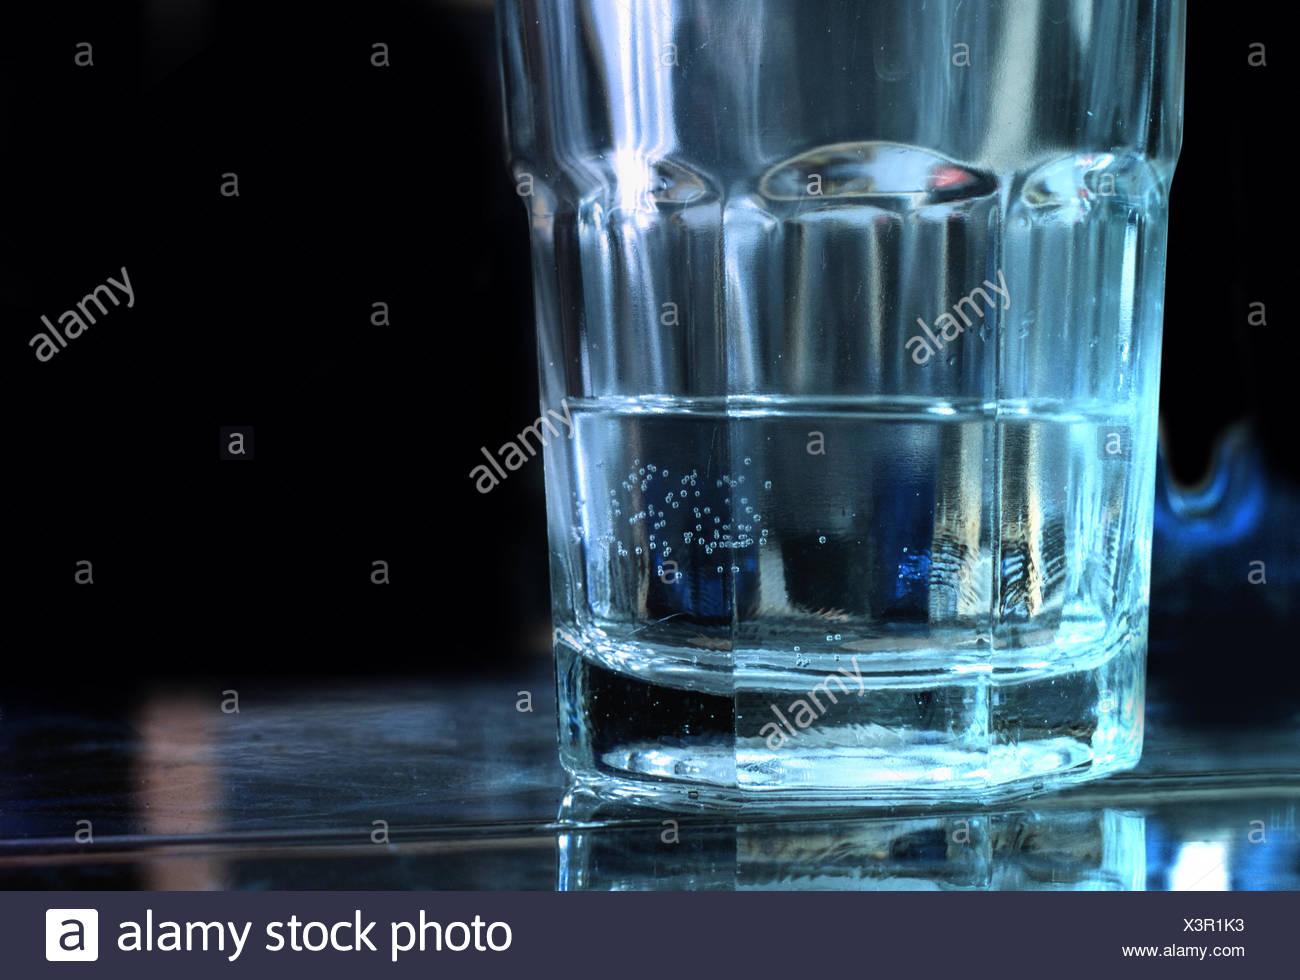 Blow drink